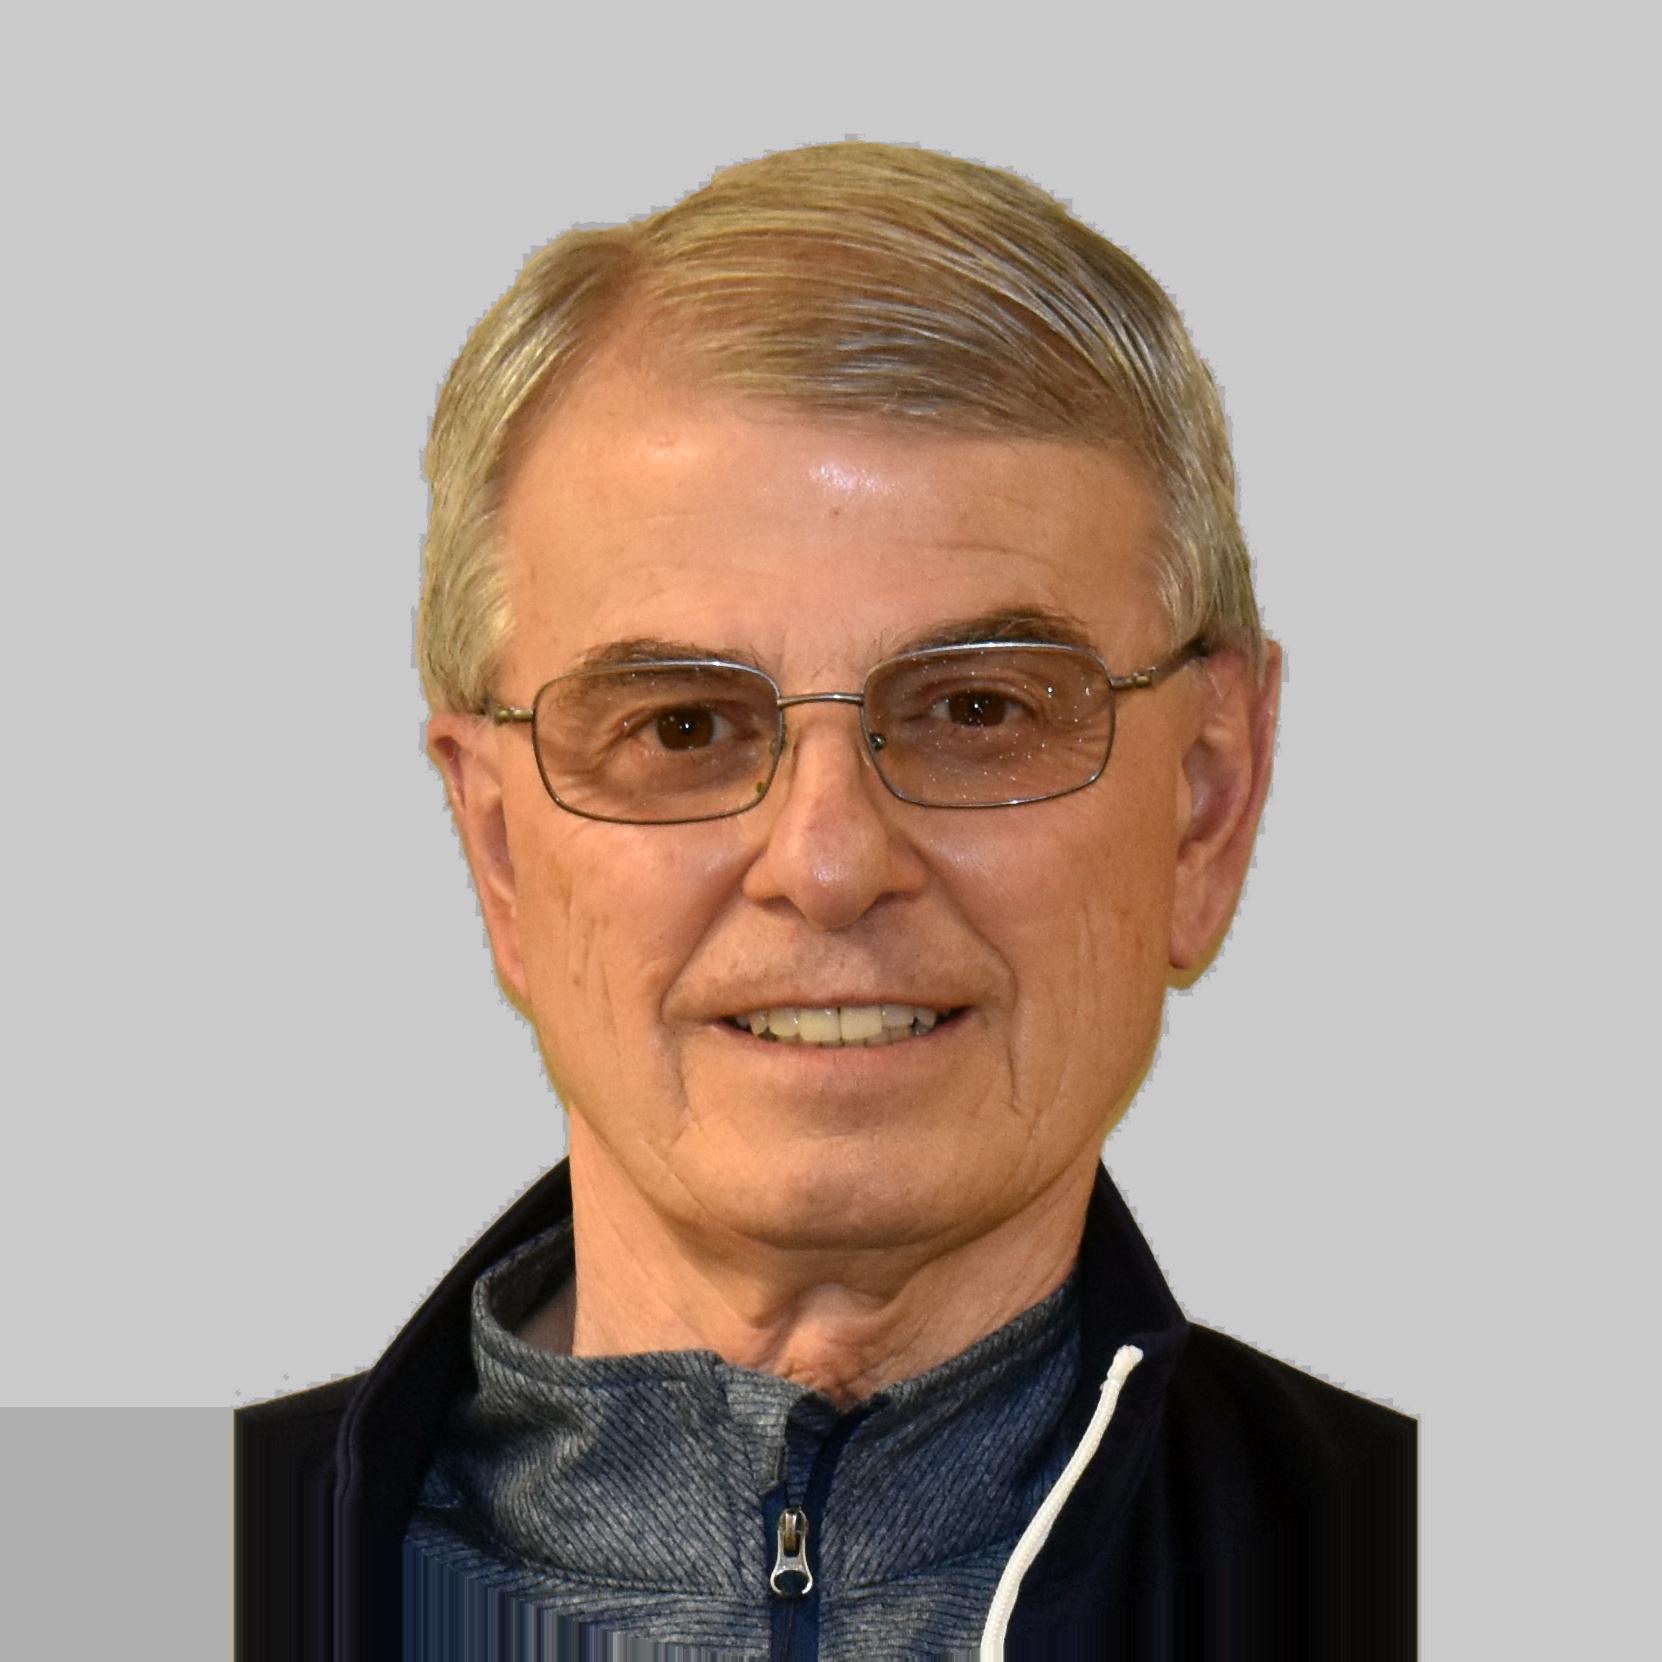 Larry Corvi